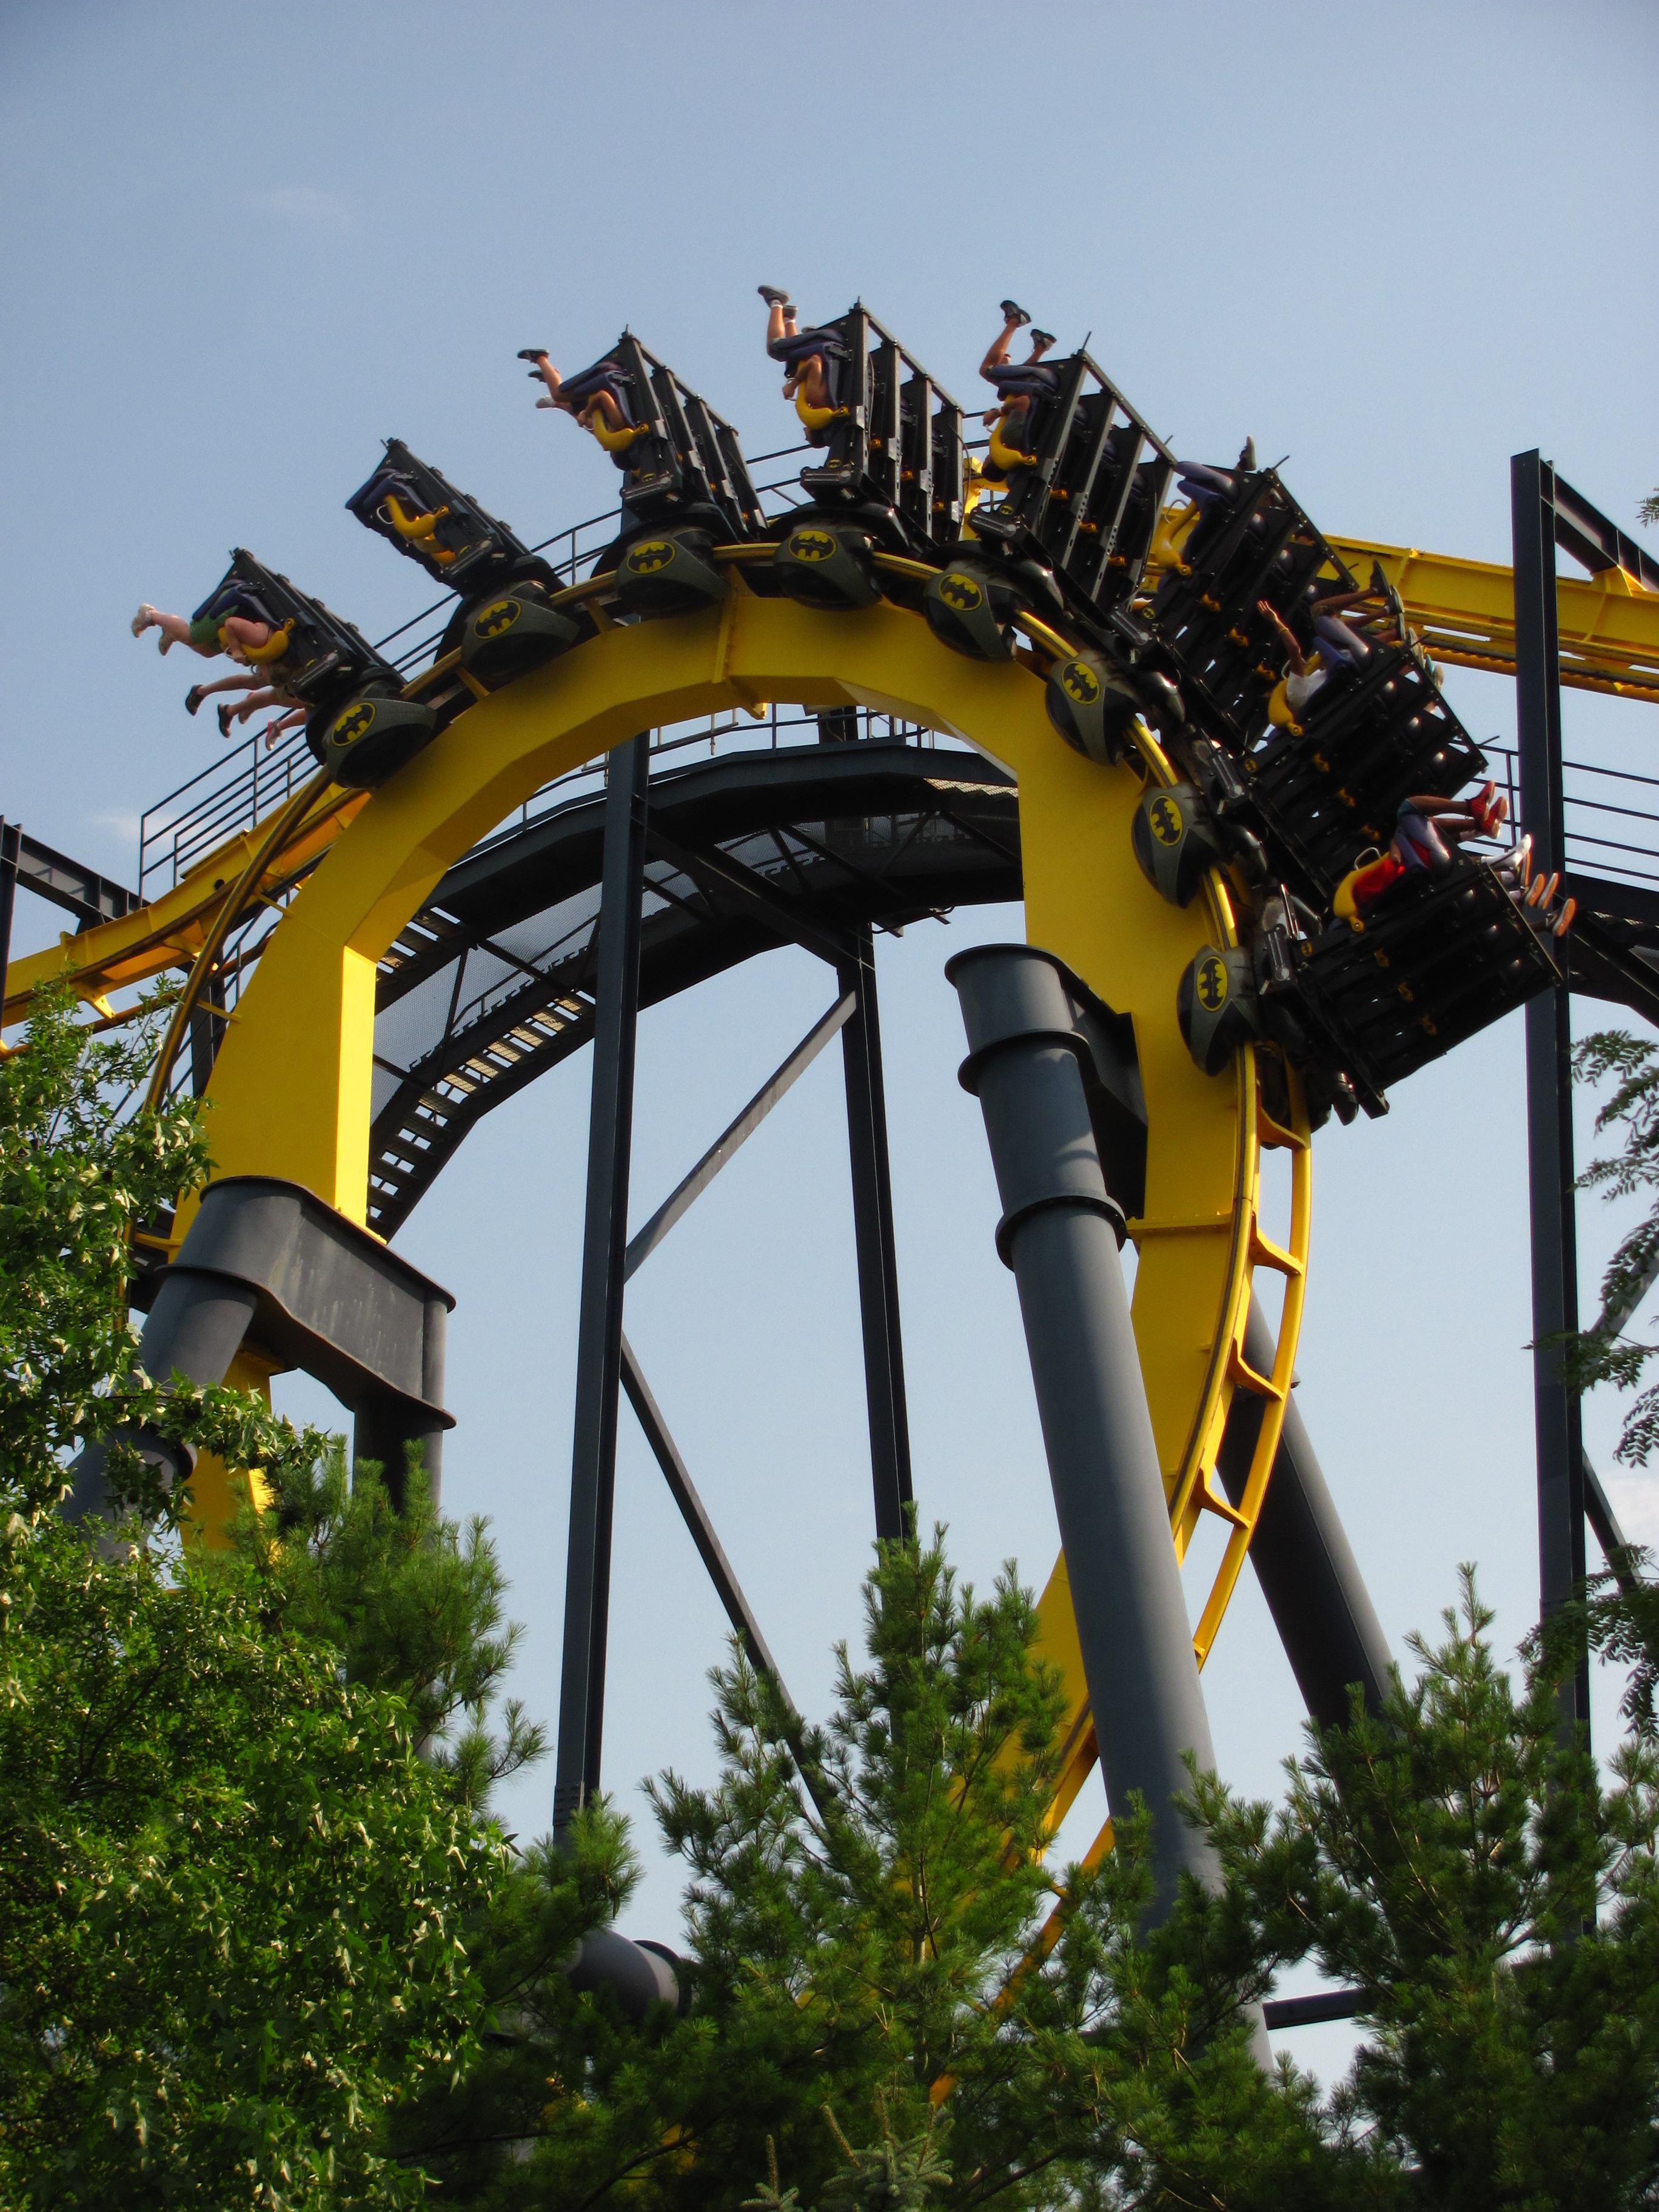 Filebatman The Ride At Six Flags Great Adventure 03 Jpg